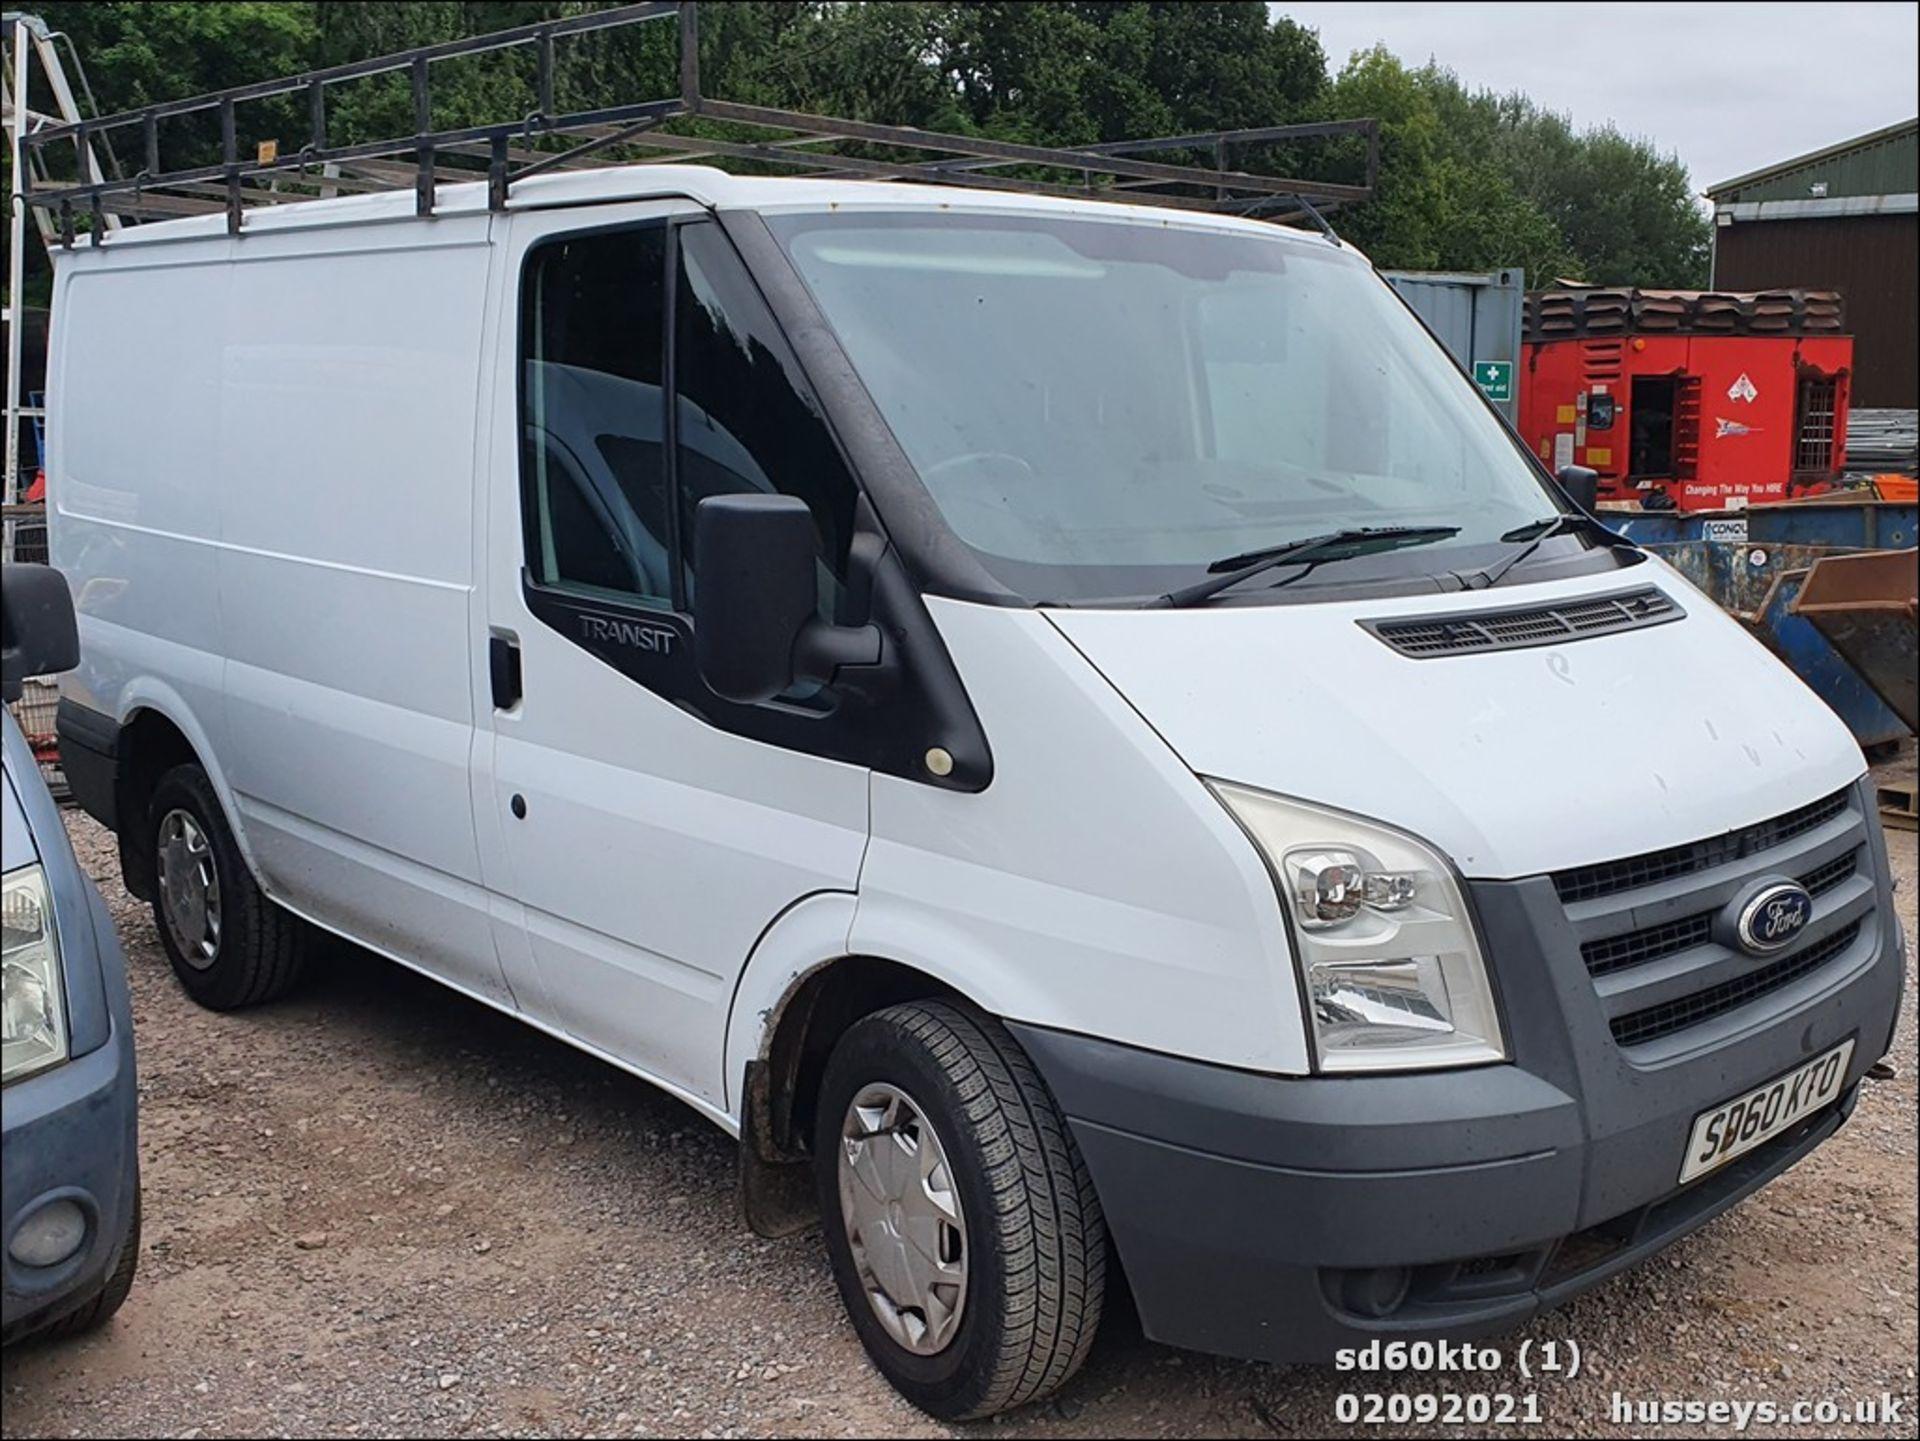 10/60 FORD TRANSIT 85 T260M FWD - 2198cc 5dr Van (White, 237k) - Image 4 of 23